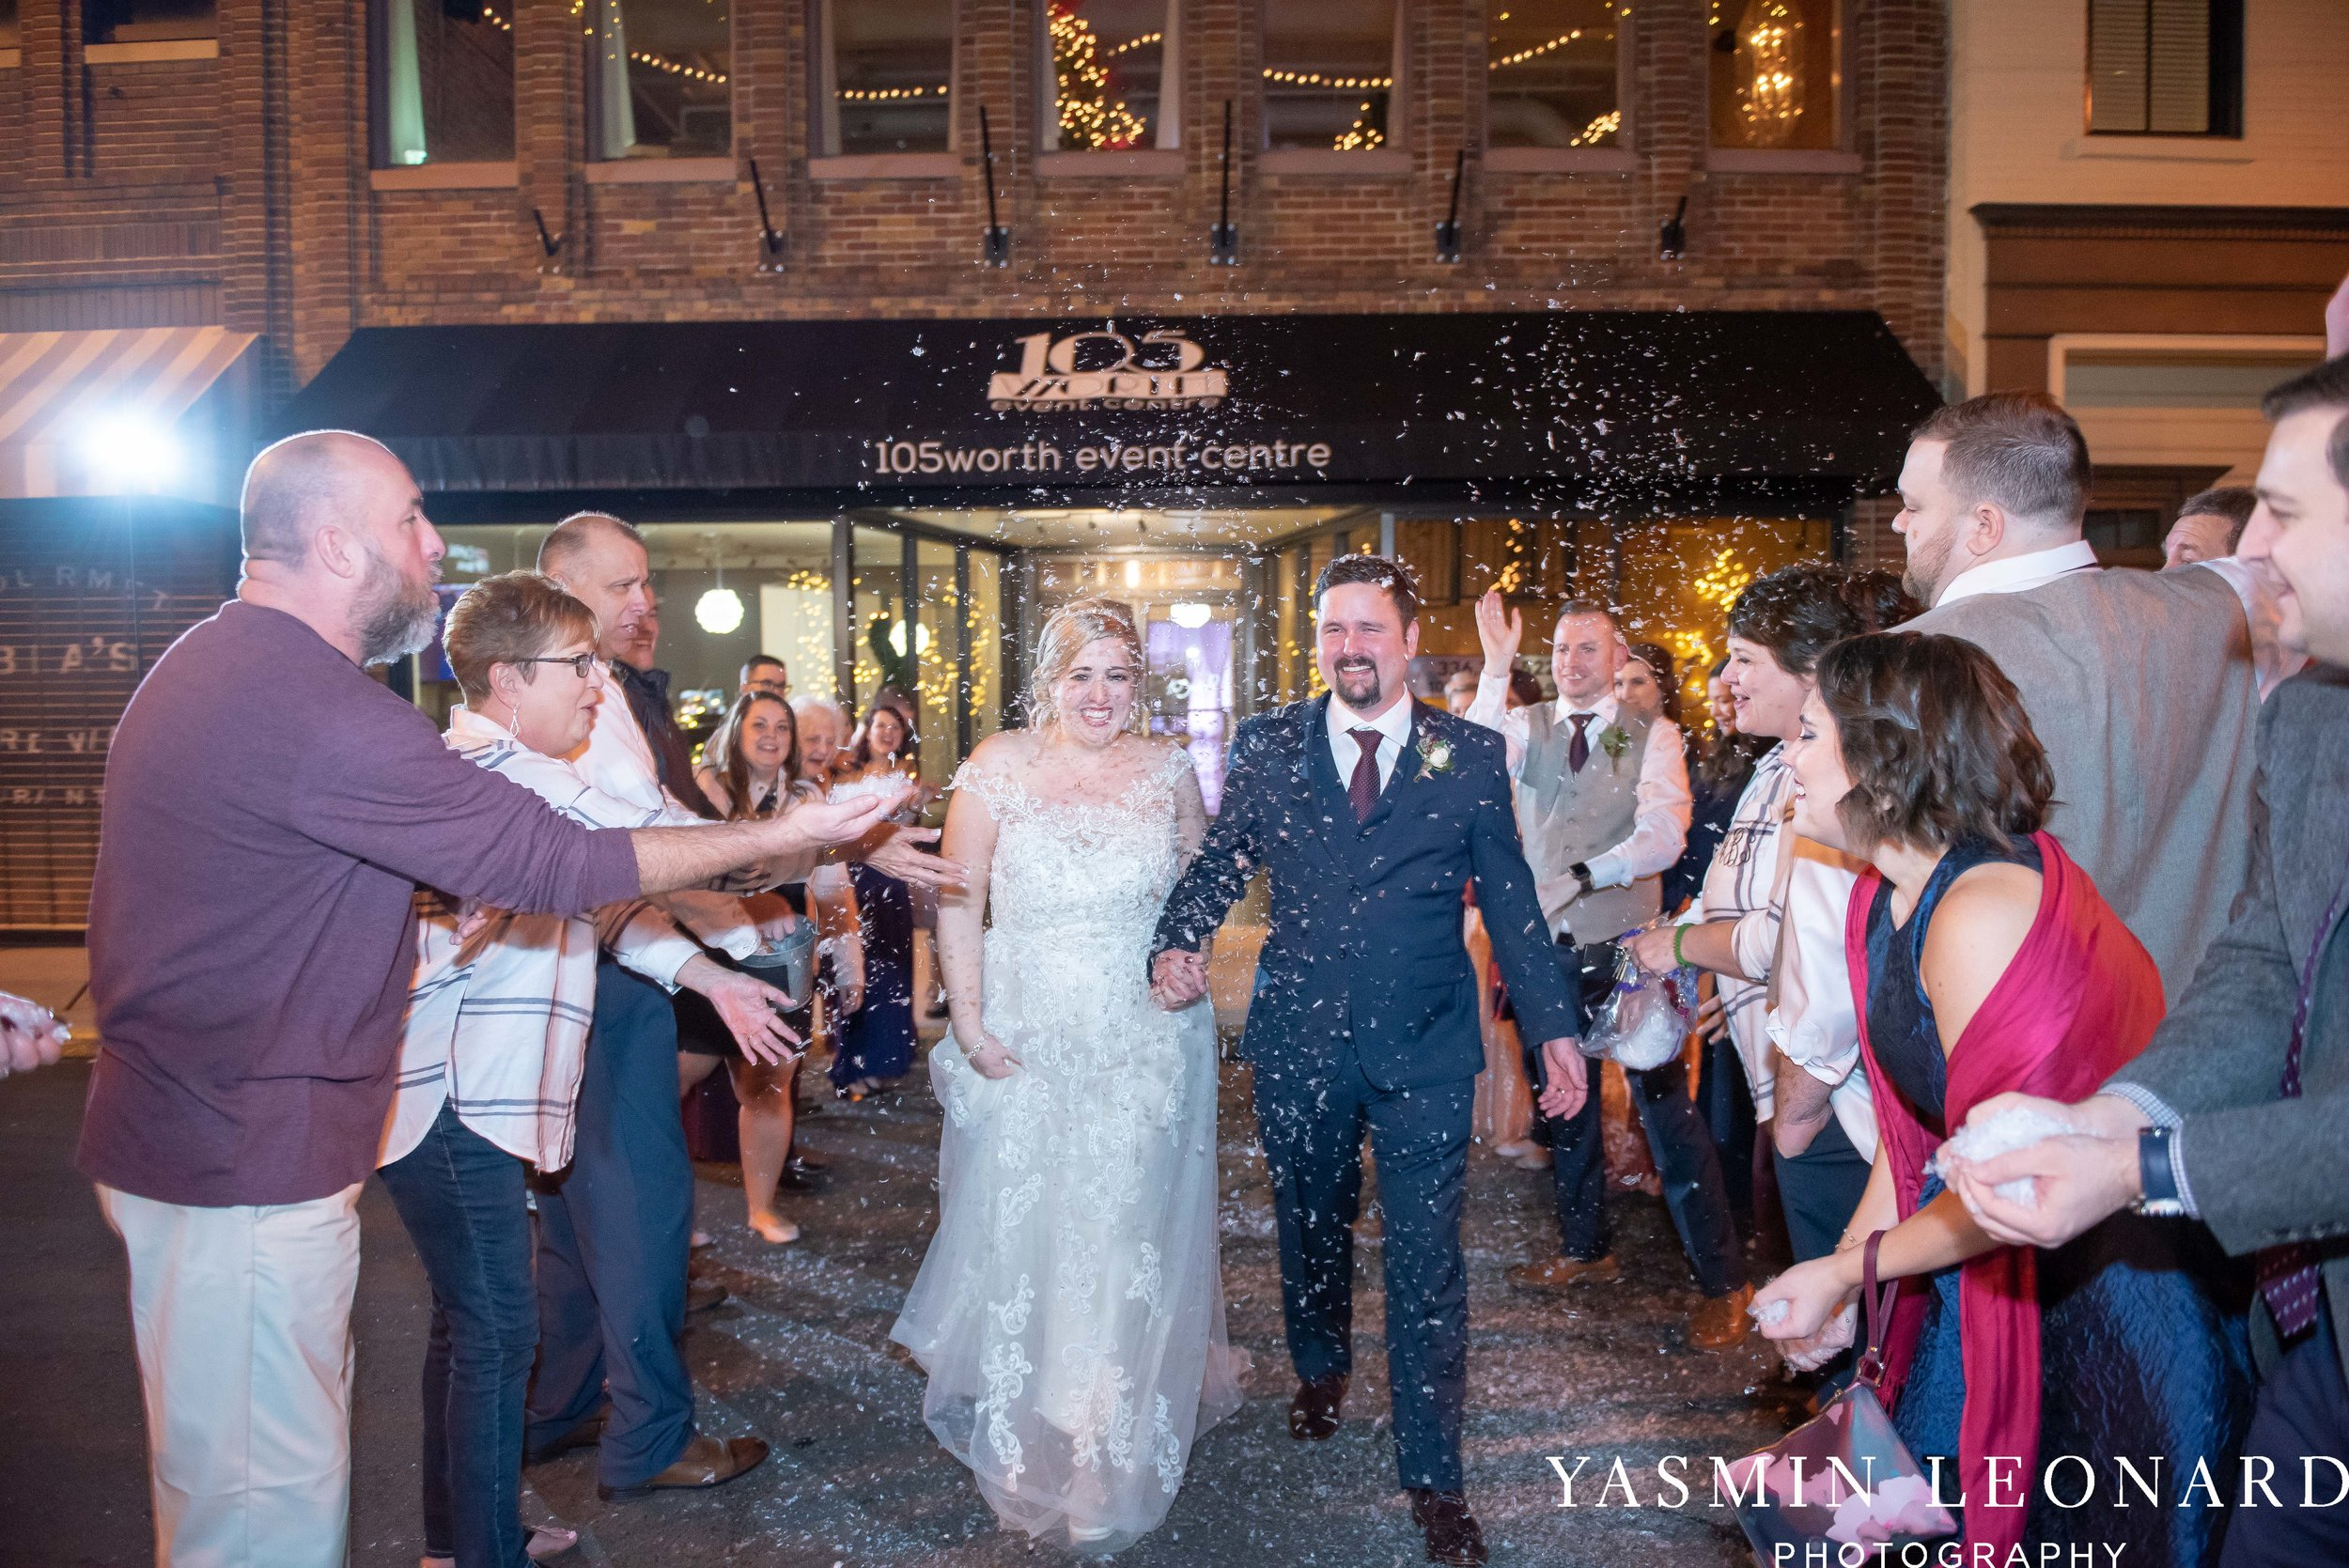 Rebekah and Matt - 105 Worth Event Centre - Yasmin Leonard Photography - Asheboro Wedding - NC Wedding - High Point Weddings - Triad Weddings - Winter Wedding-92.jpg